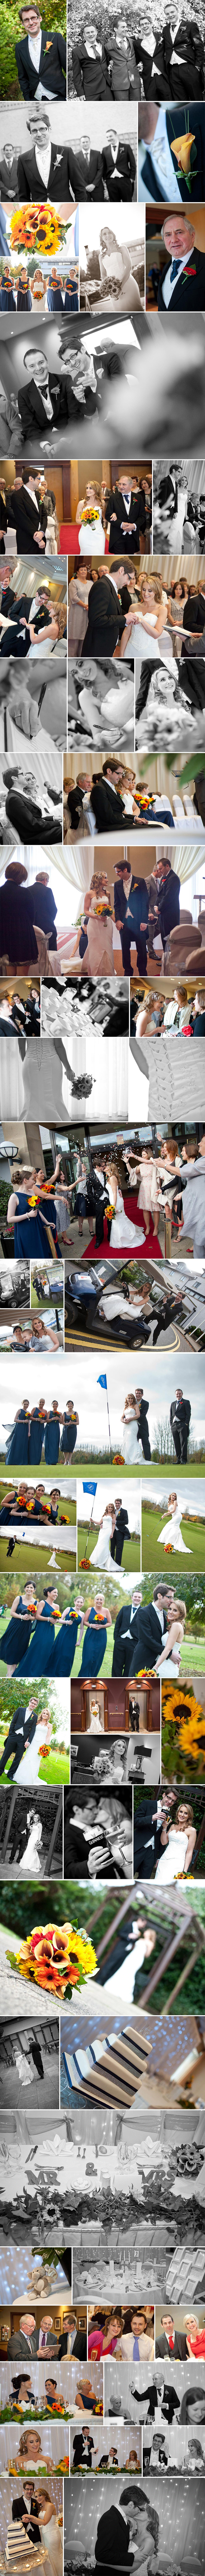 wedding_photography_hilton_templepatrick